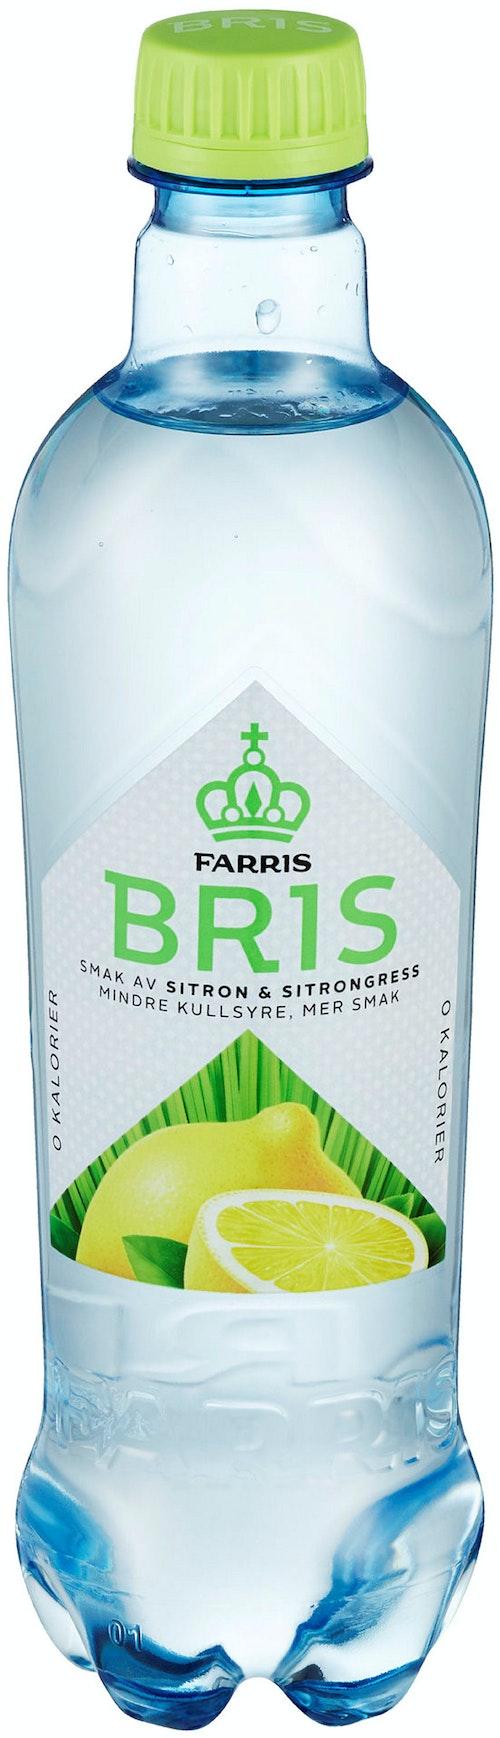 Ringnes Farris Bris Sitron & Sitrongress 0,5 l